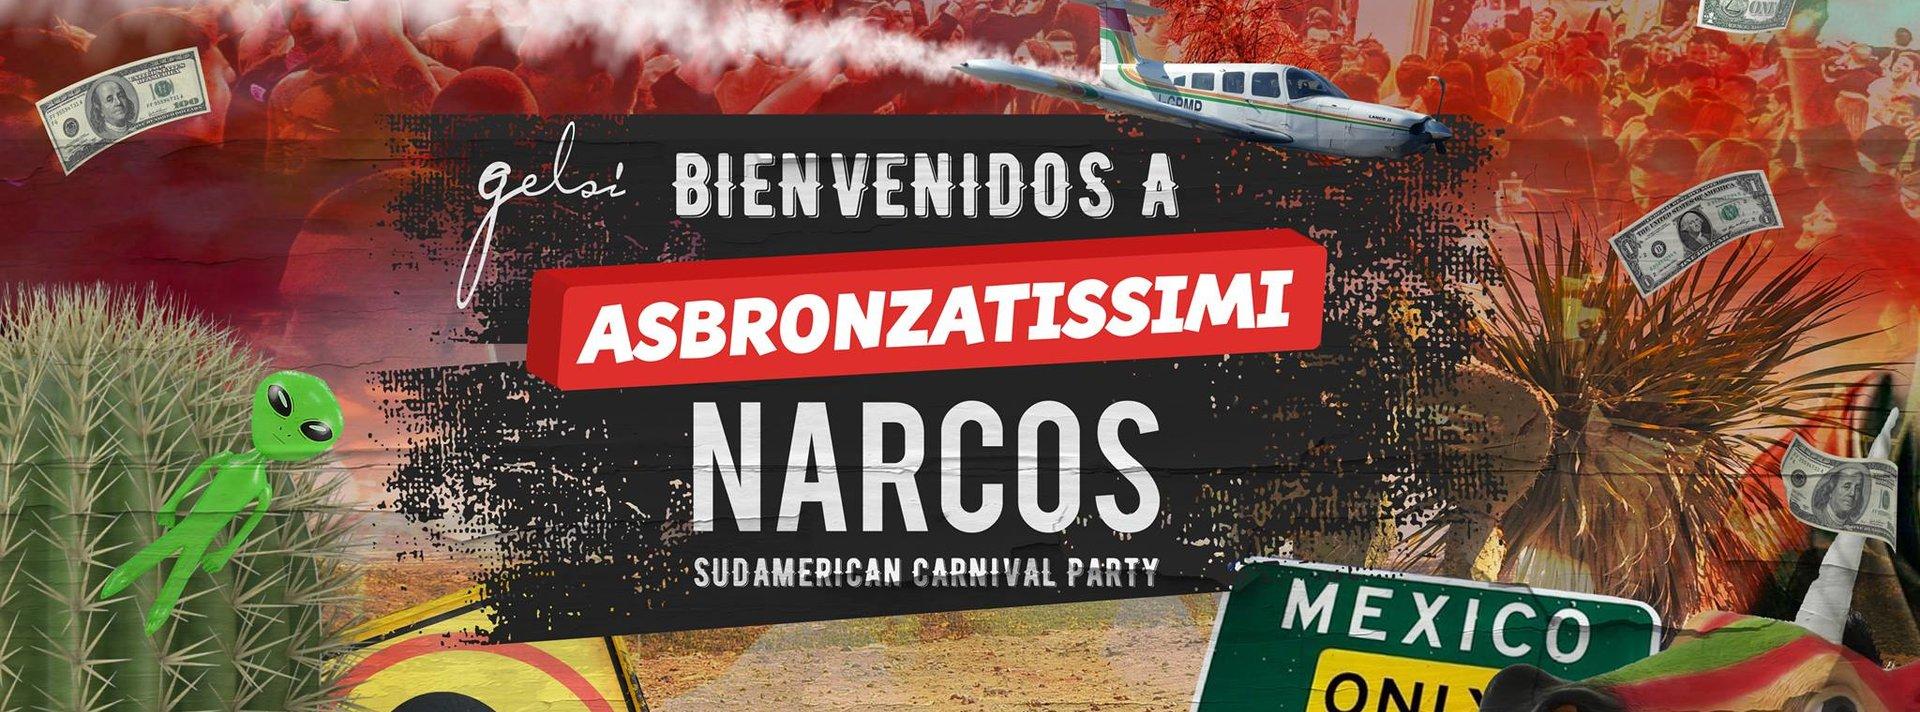 Asbronzatissimi Narcos